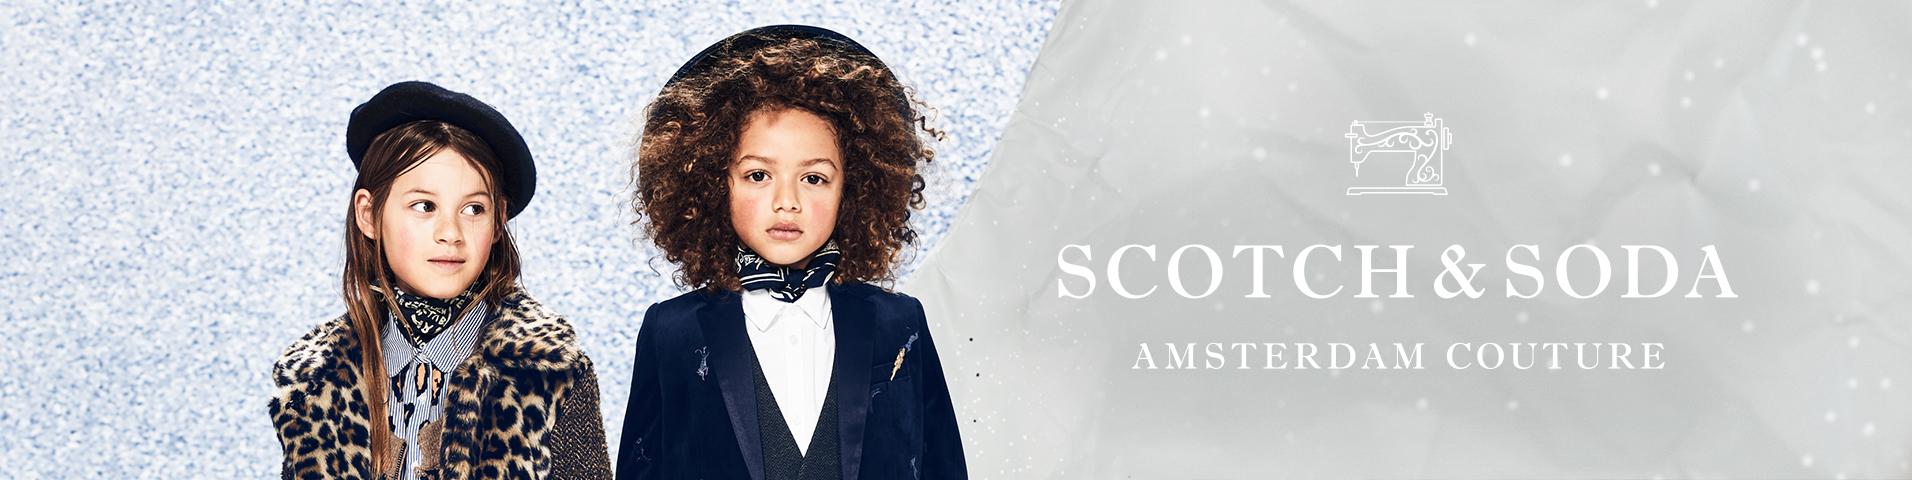 Kinderkleding Zalando.Scotch Soda Outlet Kinderkleding Zalando Ontdek Het Hier